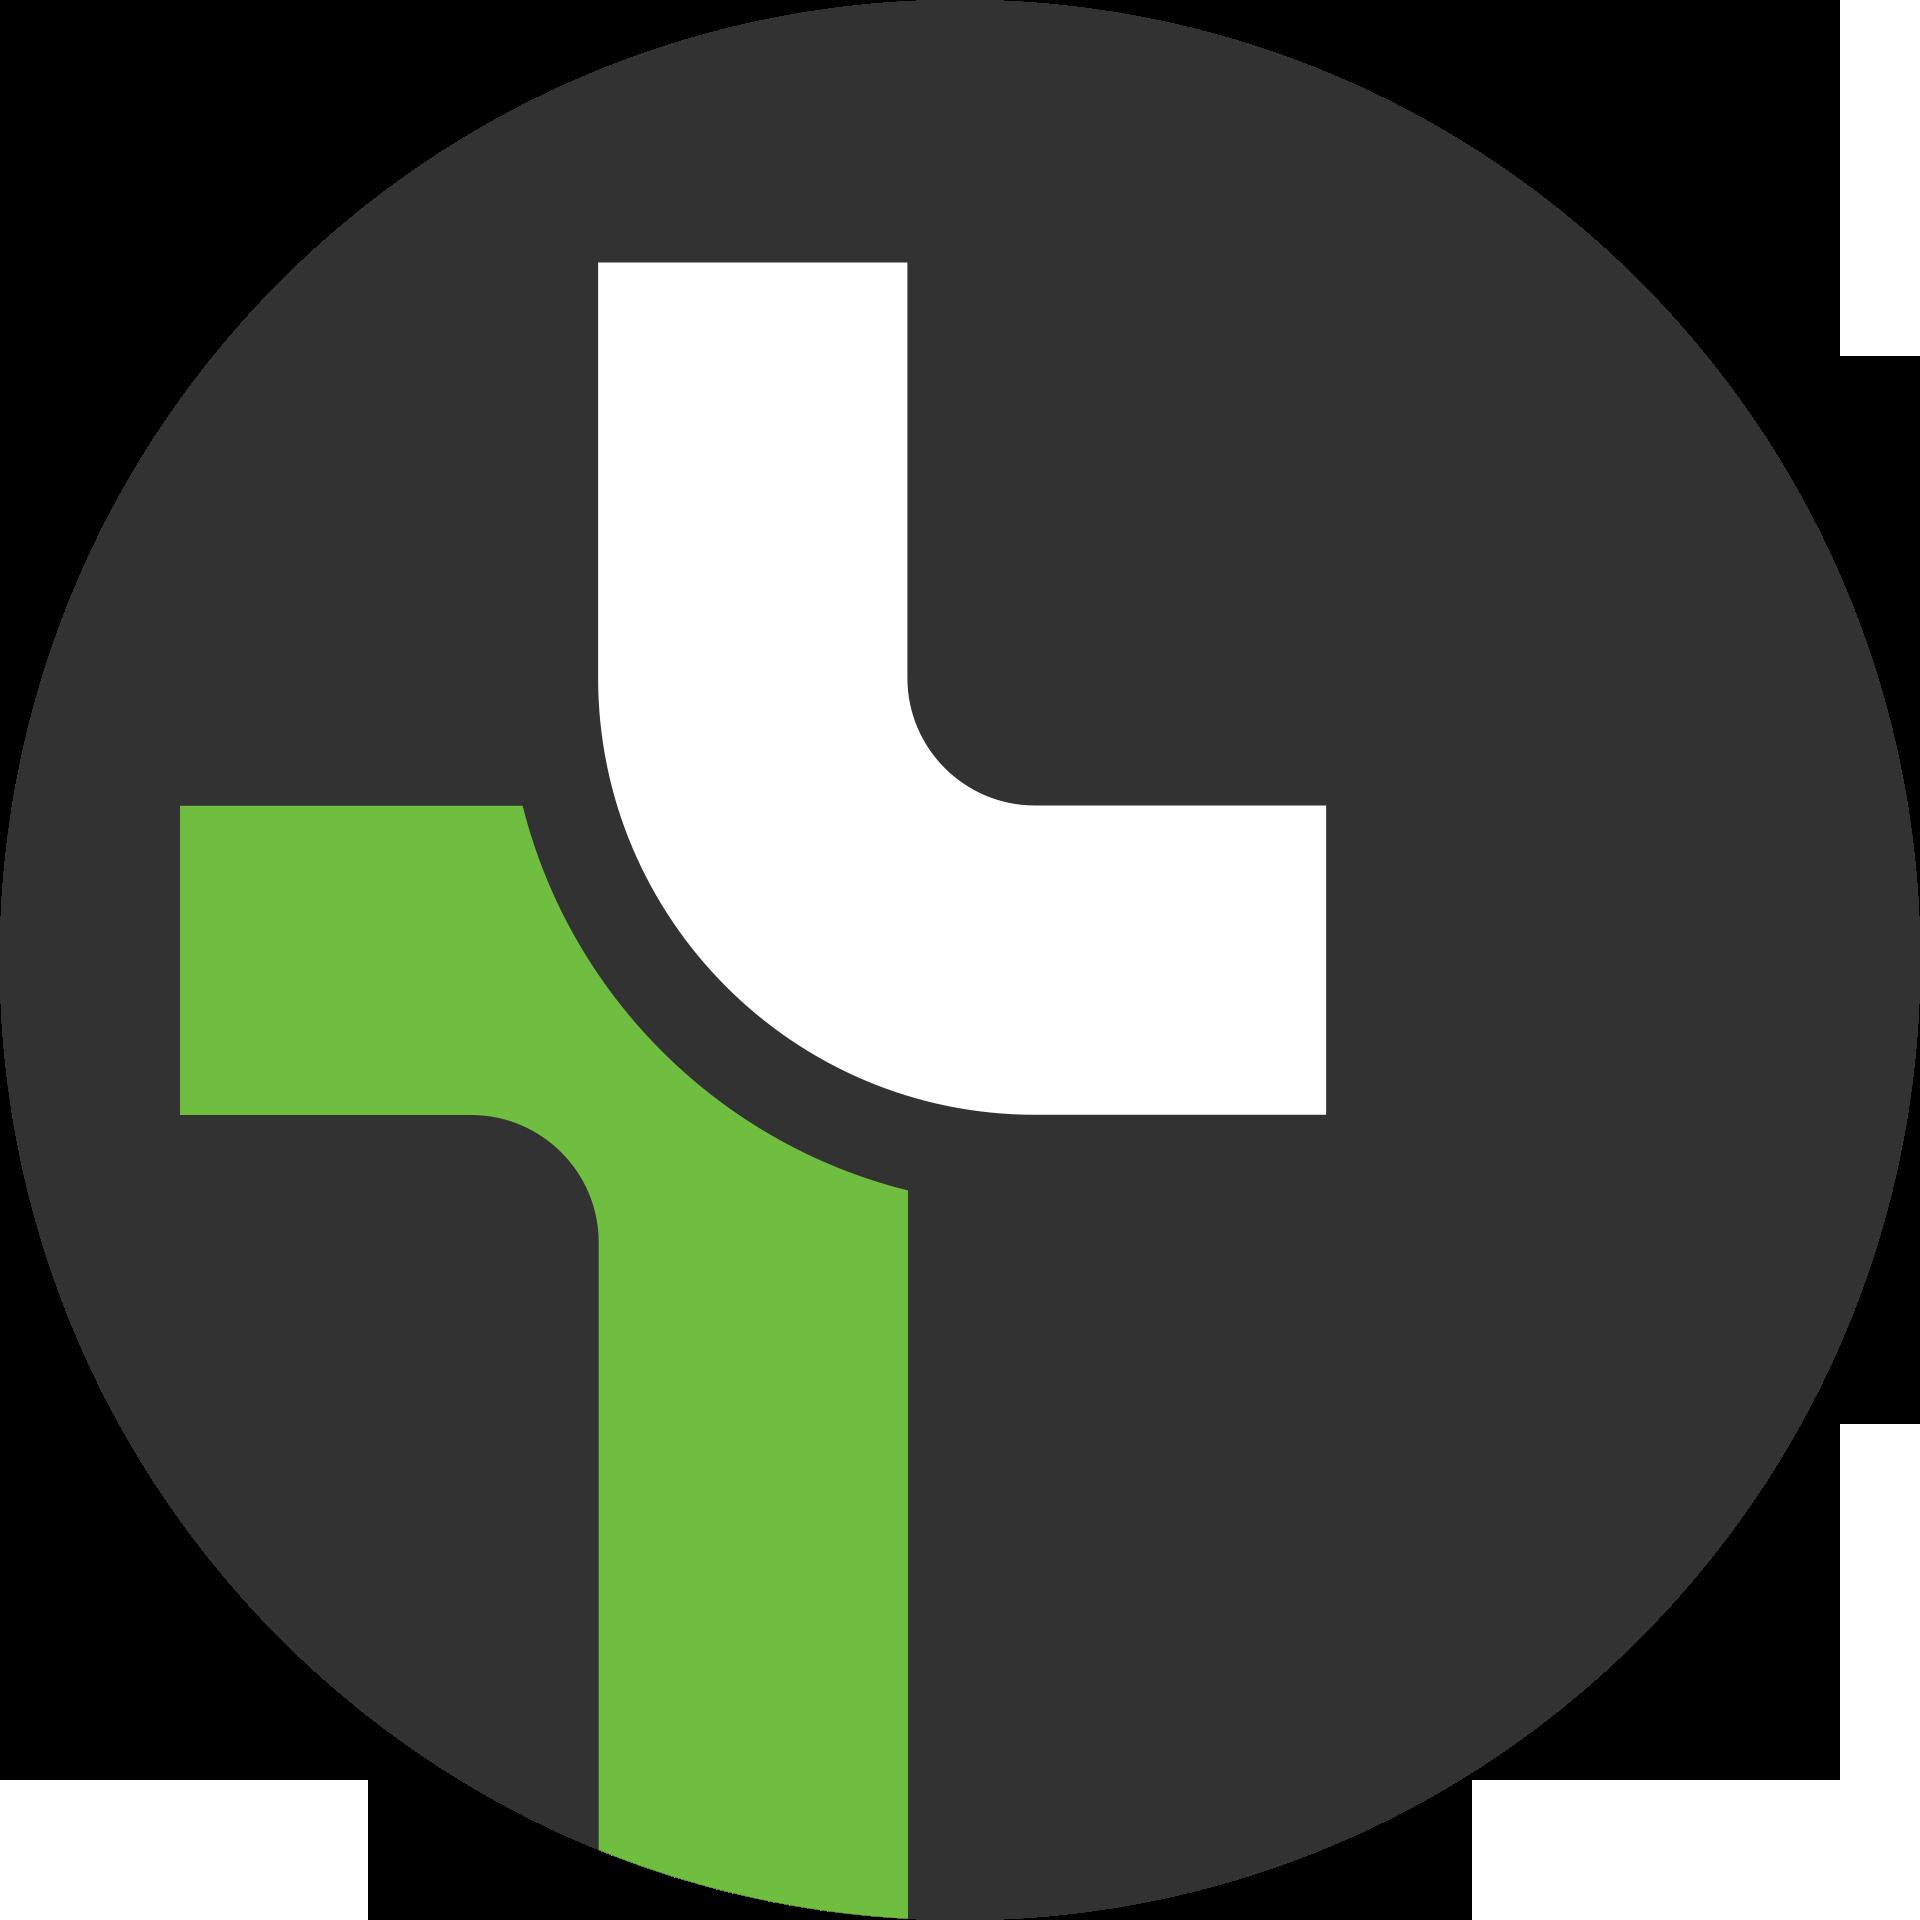 graphic symbol large.png